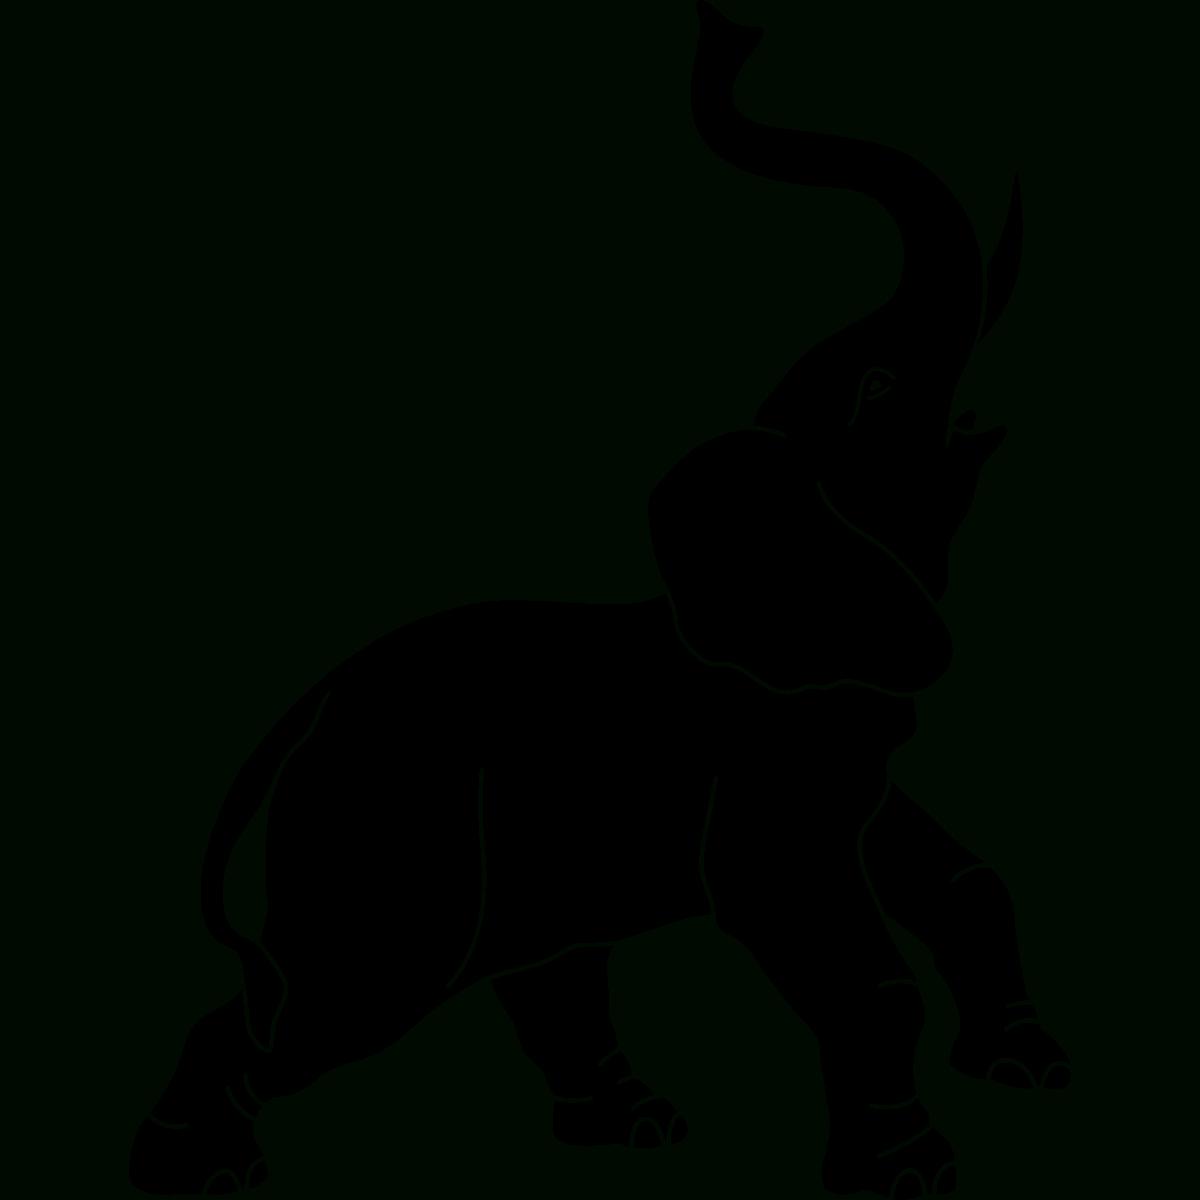 Sticker Elephant Qui Barrit concernant Barrissement Elephant